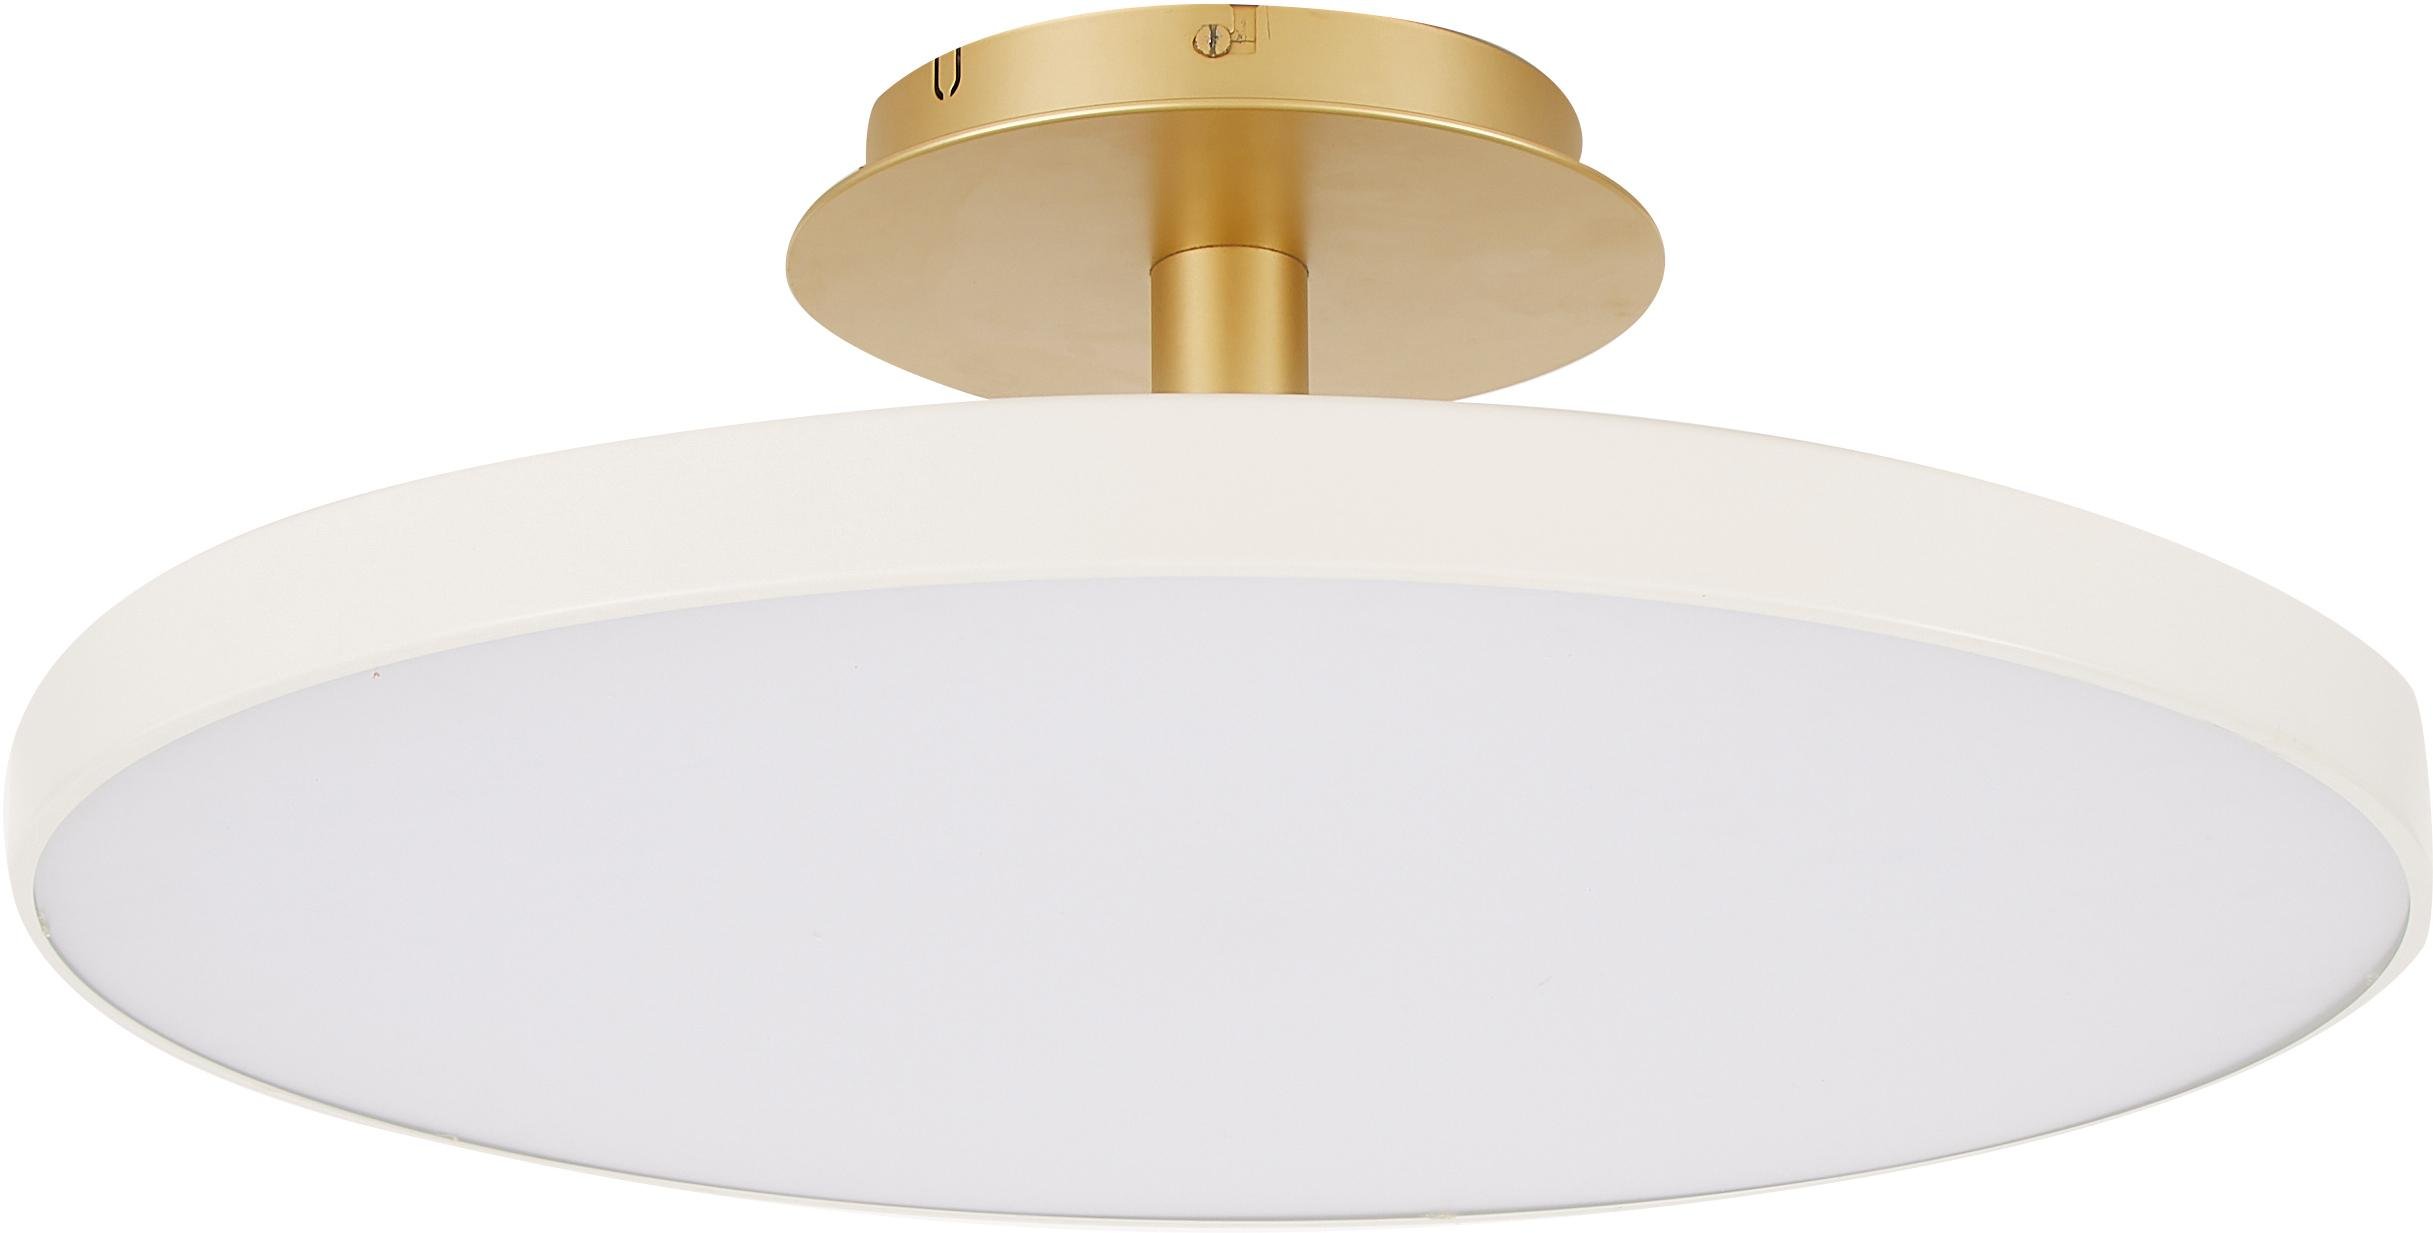 LED plafondlamp Asteria, Lampenkap: aluminium, gelakt, Crèmewit, goudkleurig, Ø 60 x H 21 cm